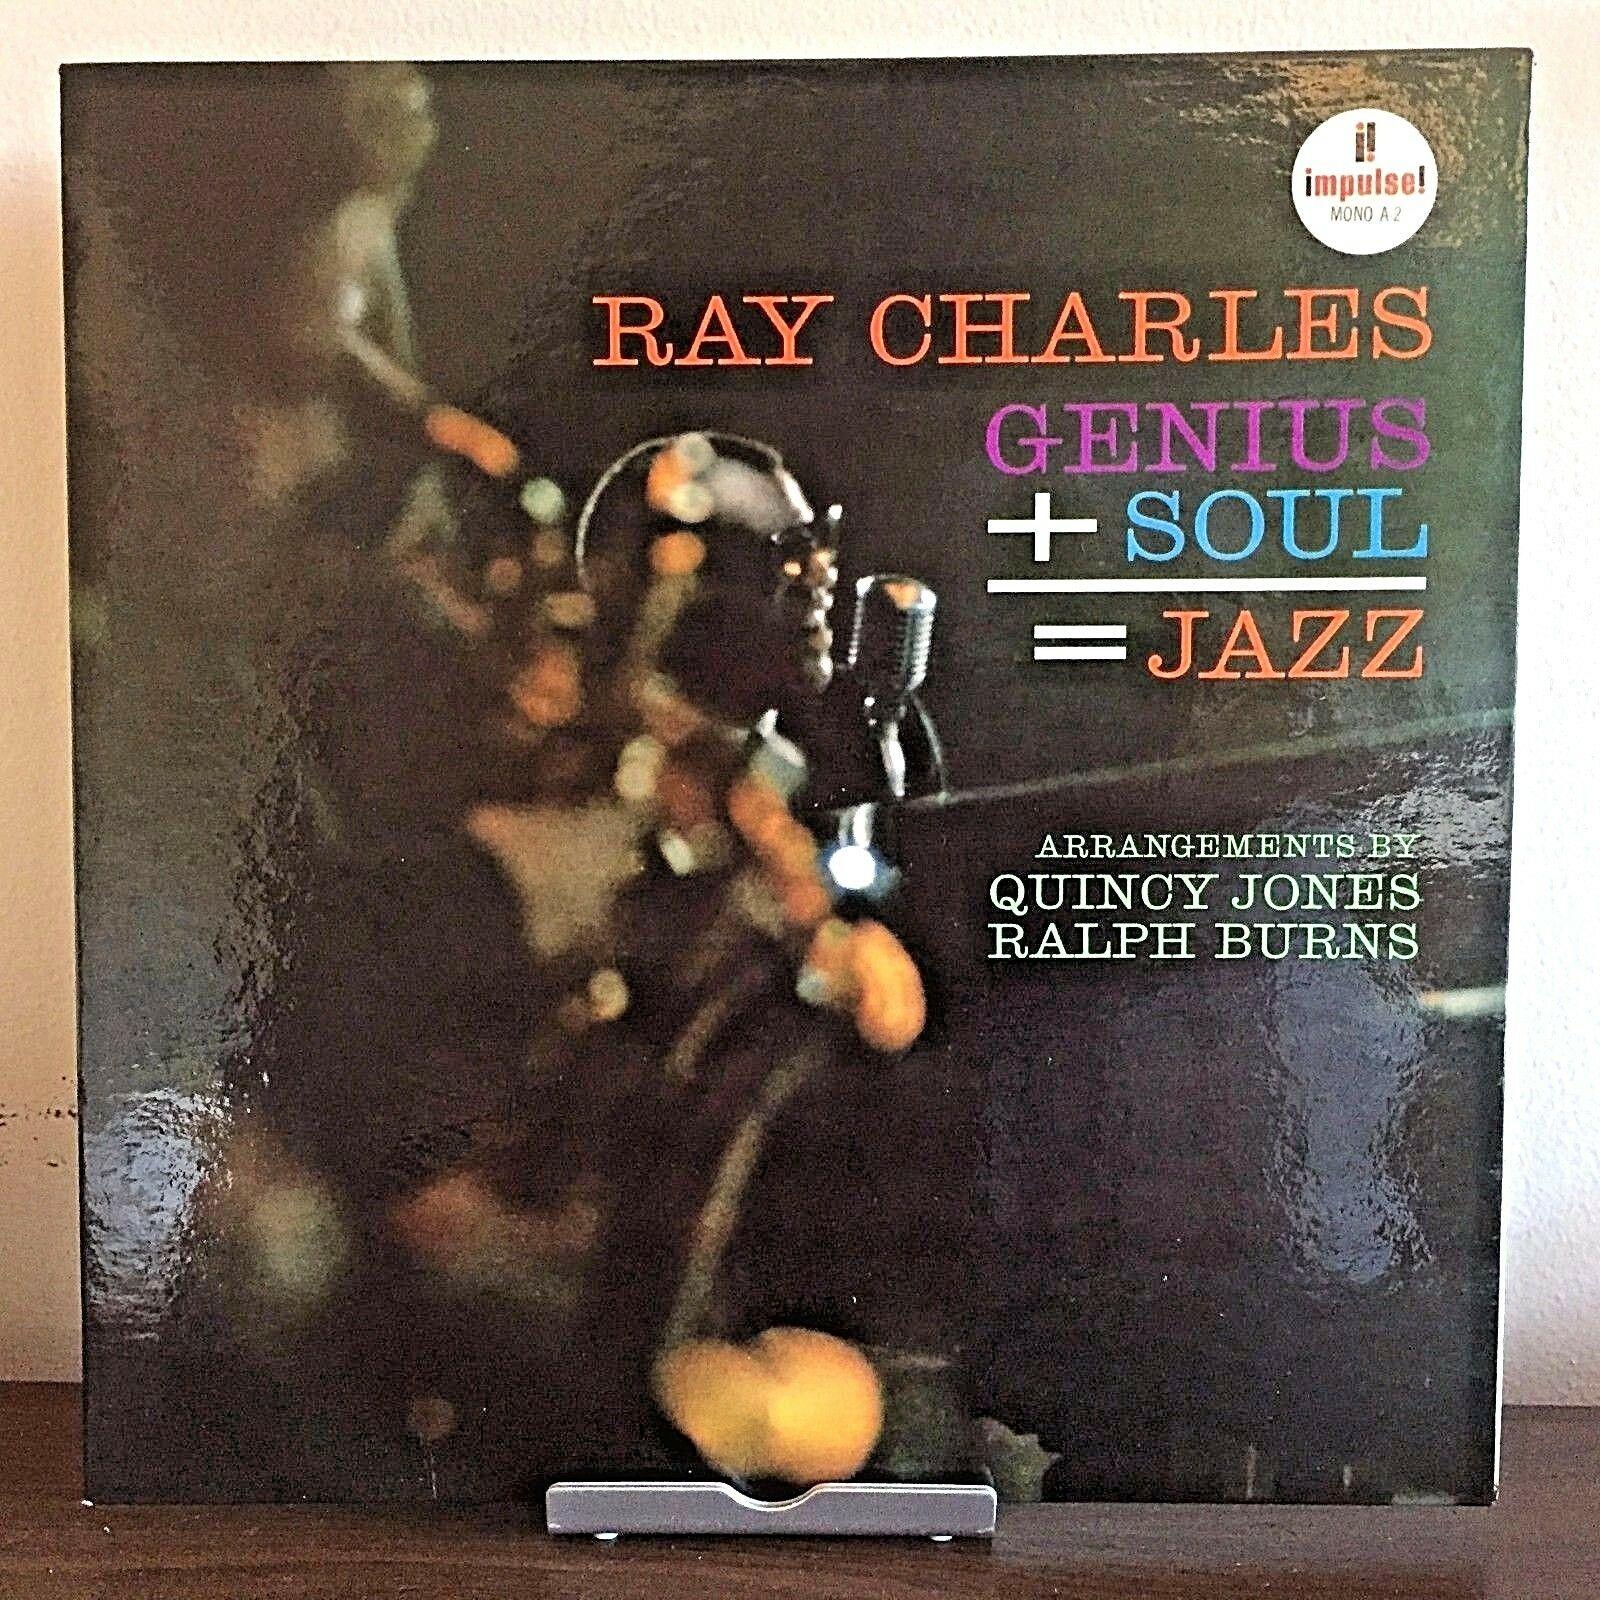 Genius+Soul=Jazz by Ray Charles 1961 Vinyl Impulse Records 1st Press Mono